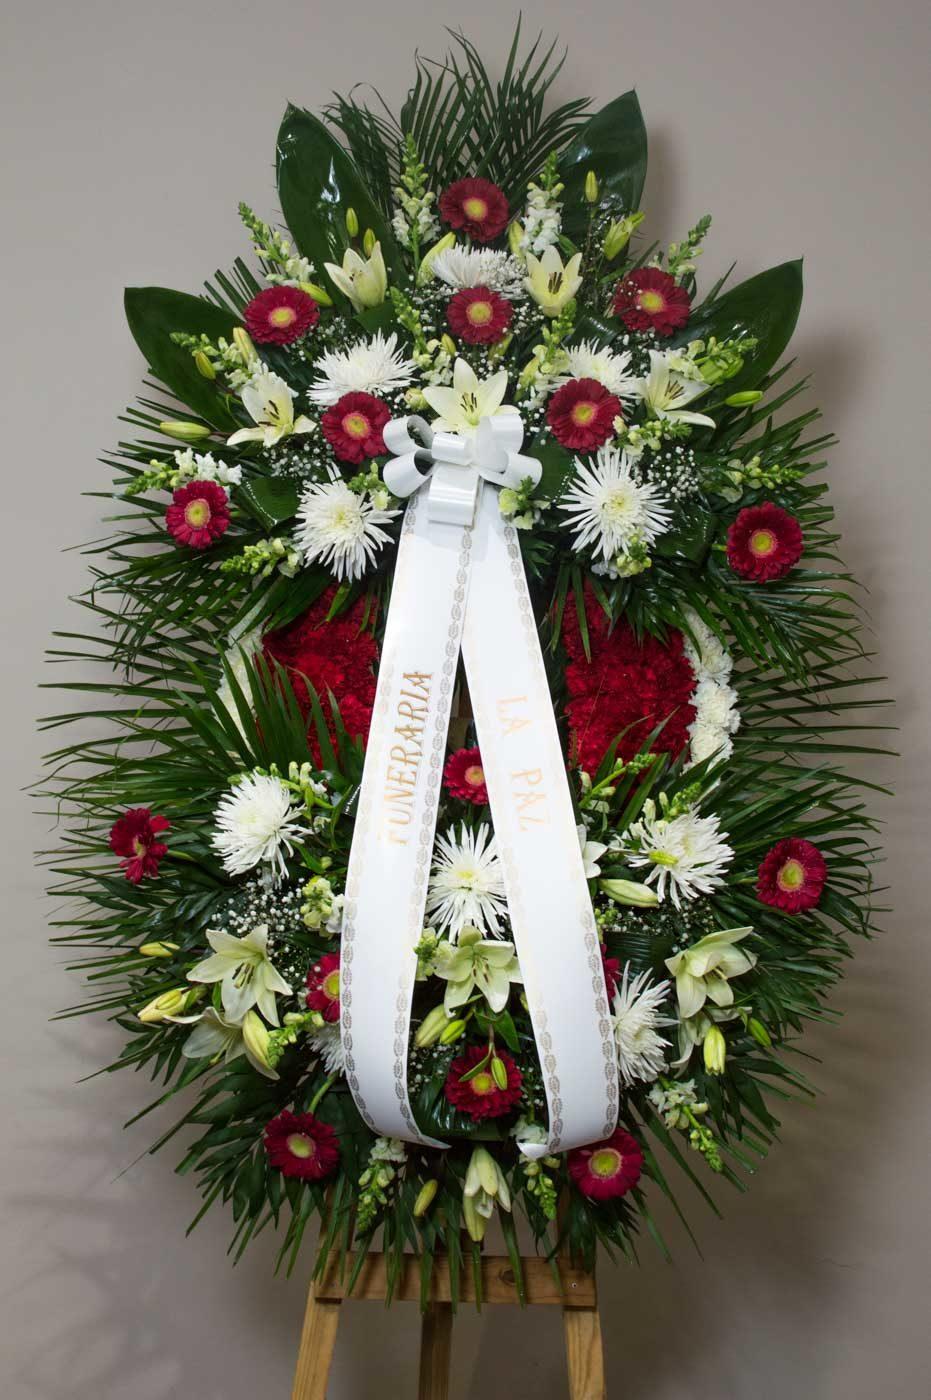 Corona 2 cabezales de flores variadas - Funeraria La Paz Verín